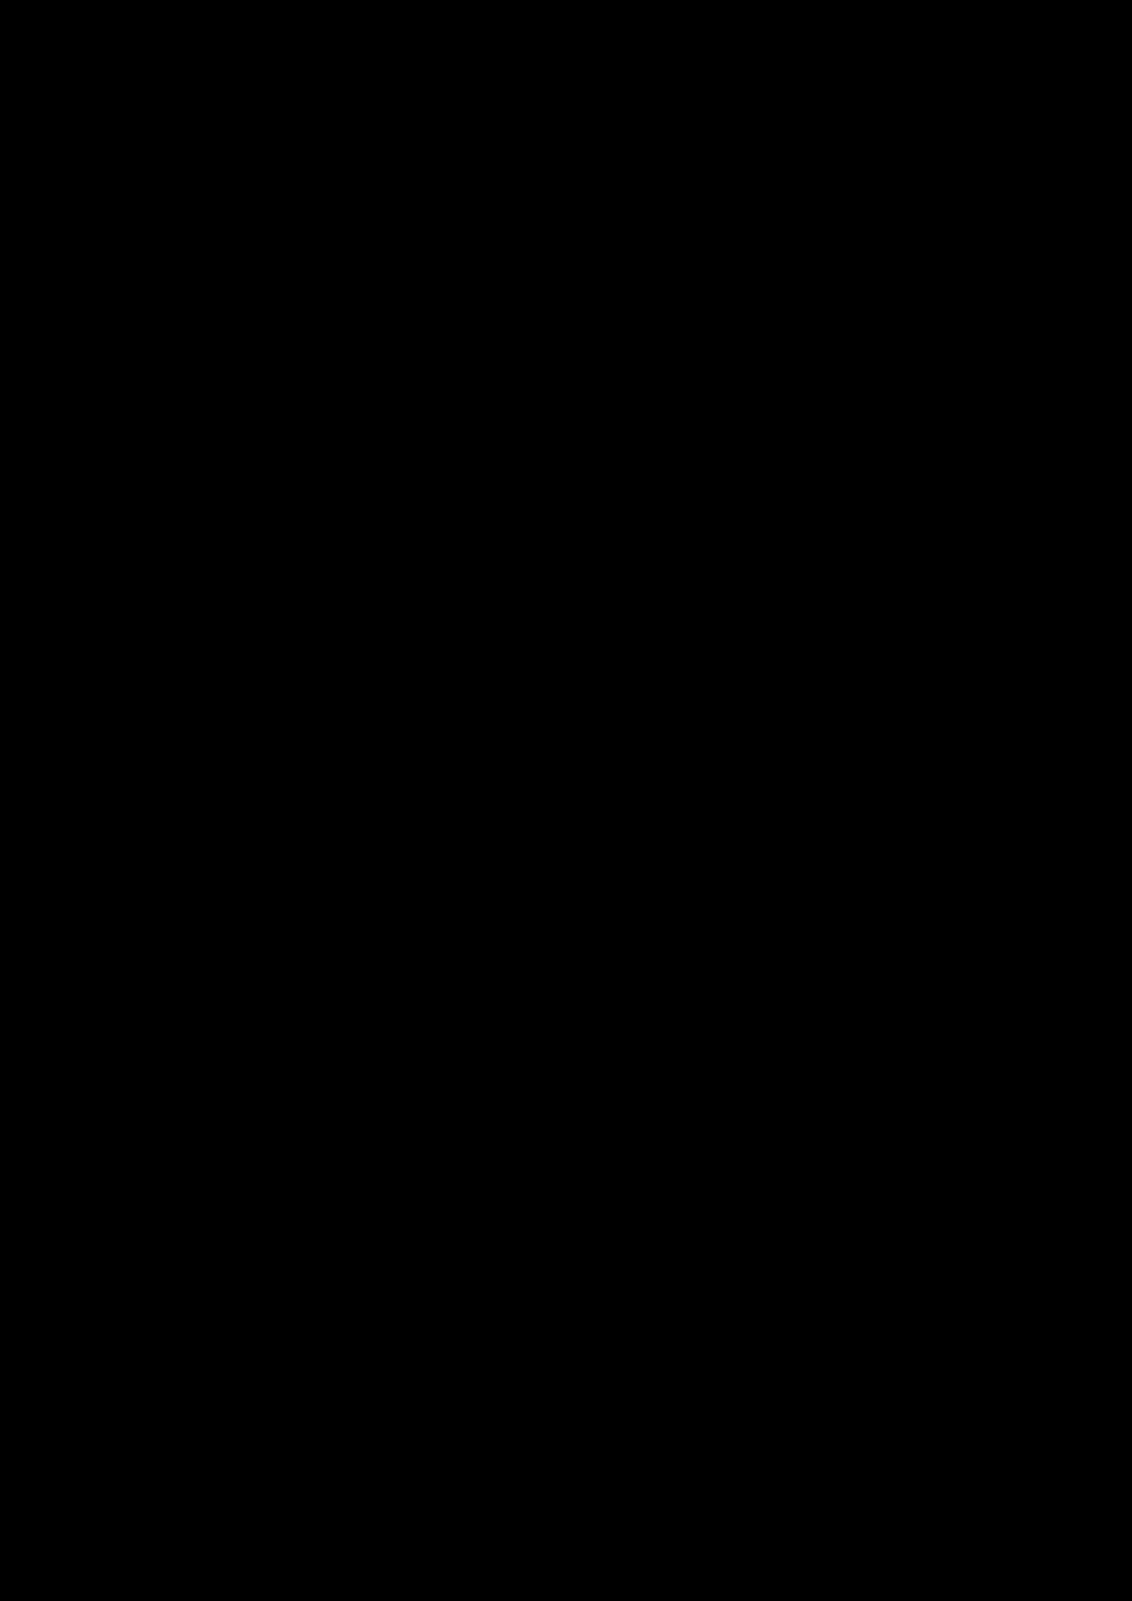 Belyiy sokol slide, Image 198